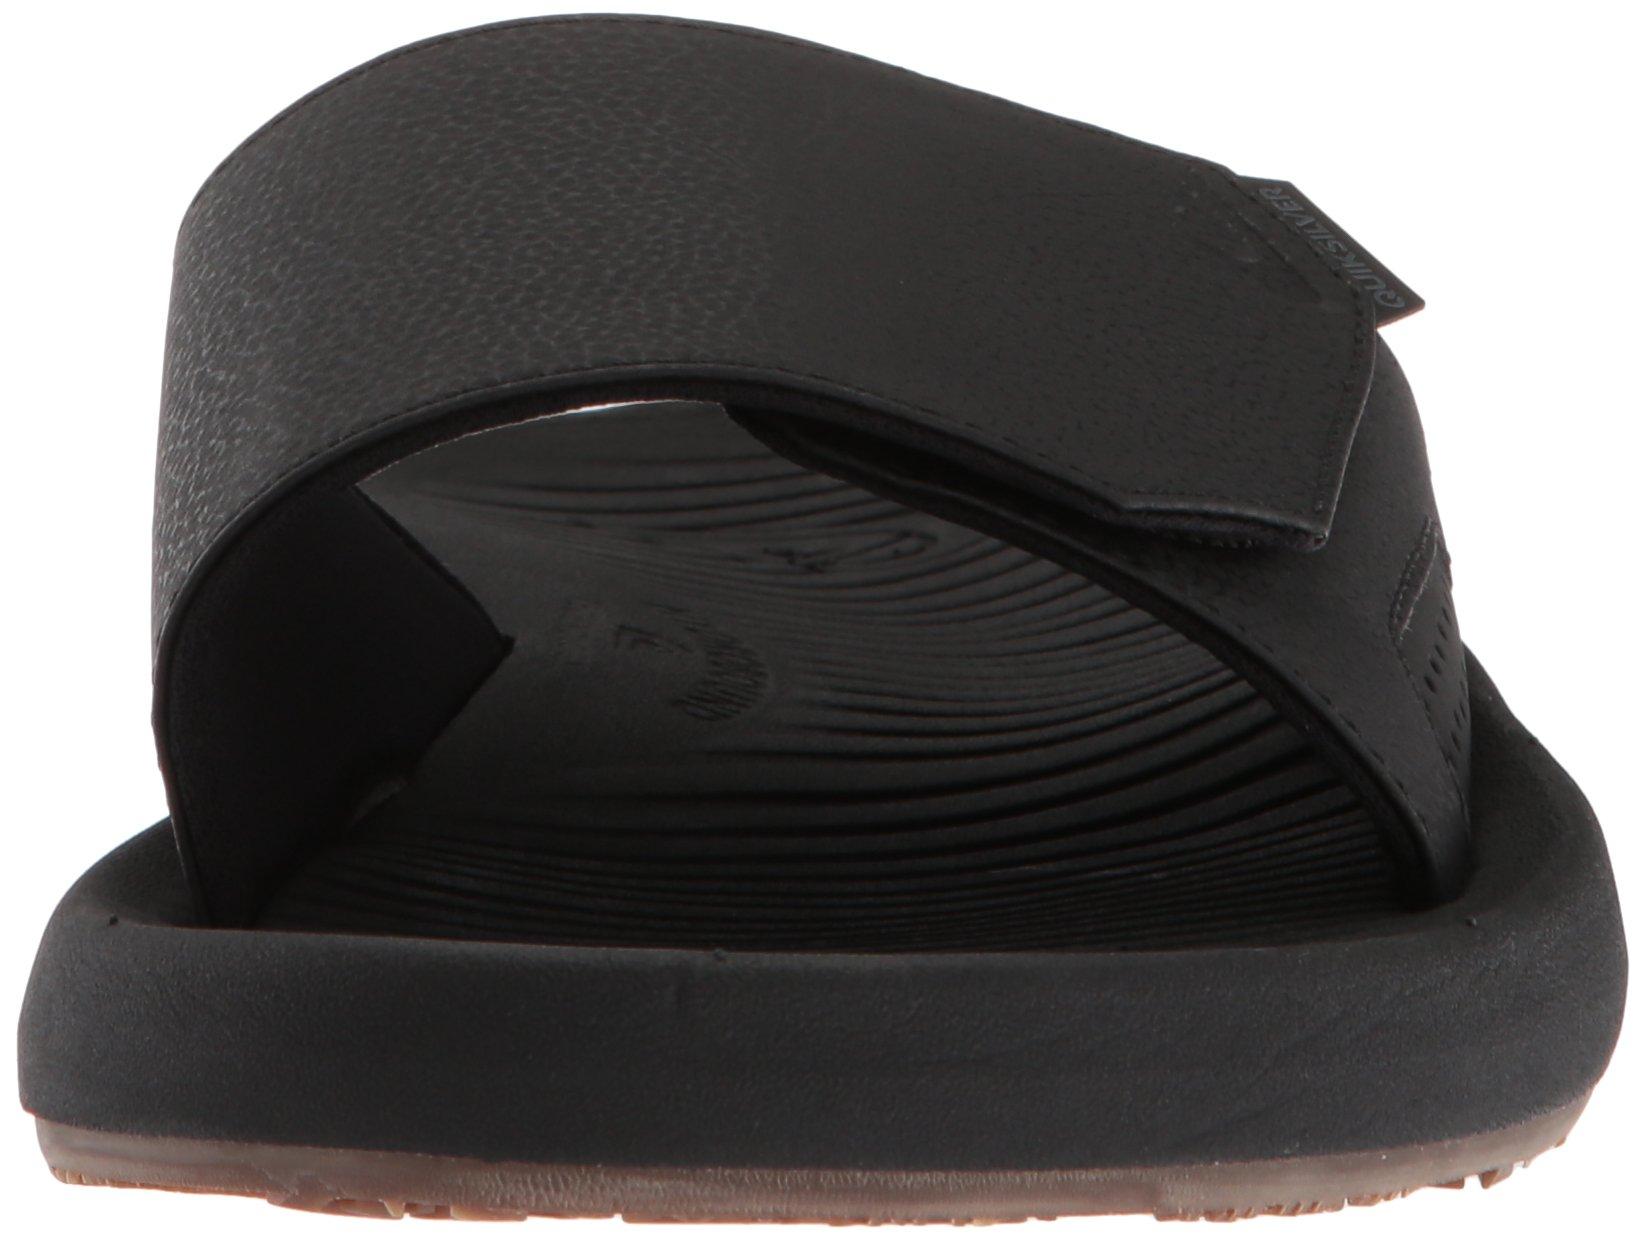 Quiksilver Men's Travel Oasis Slide Sandal, Black/Black/Brown, 8(41) M US by Quiksilver (Image #4)